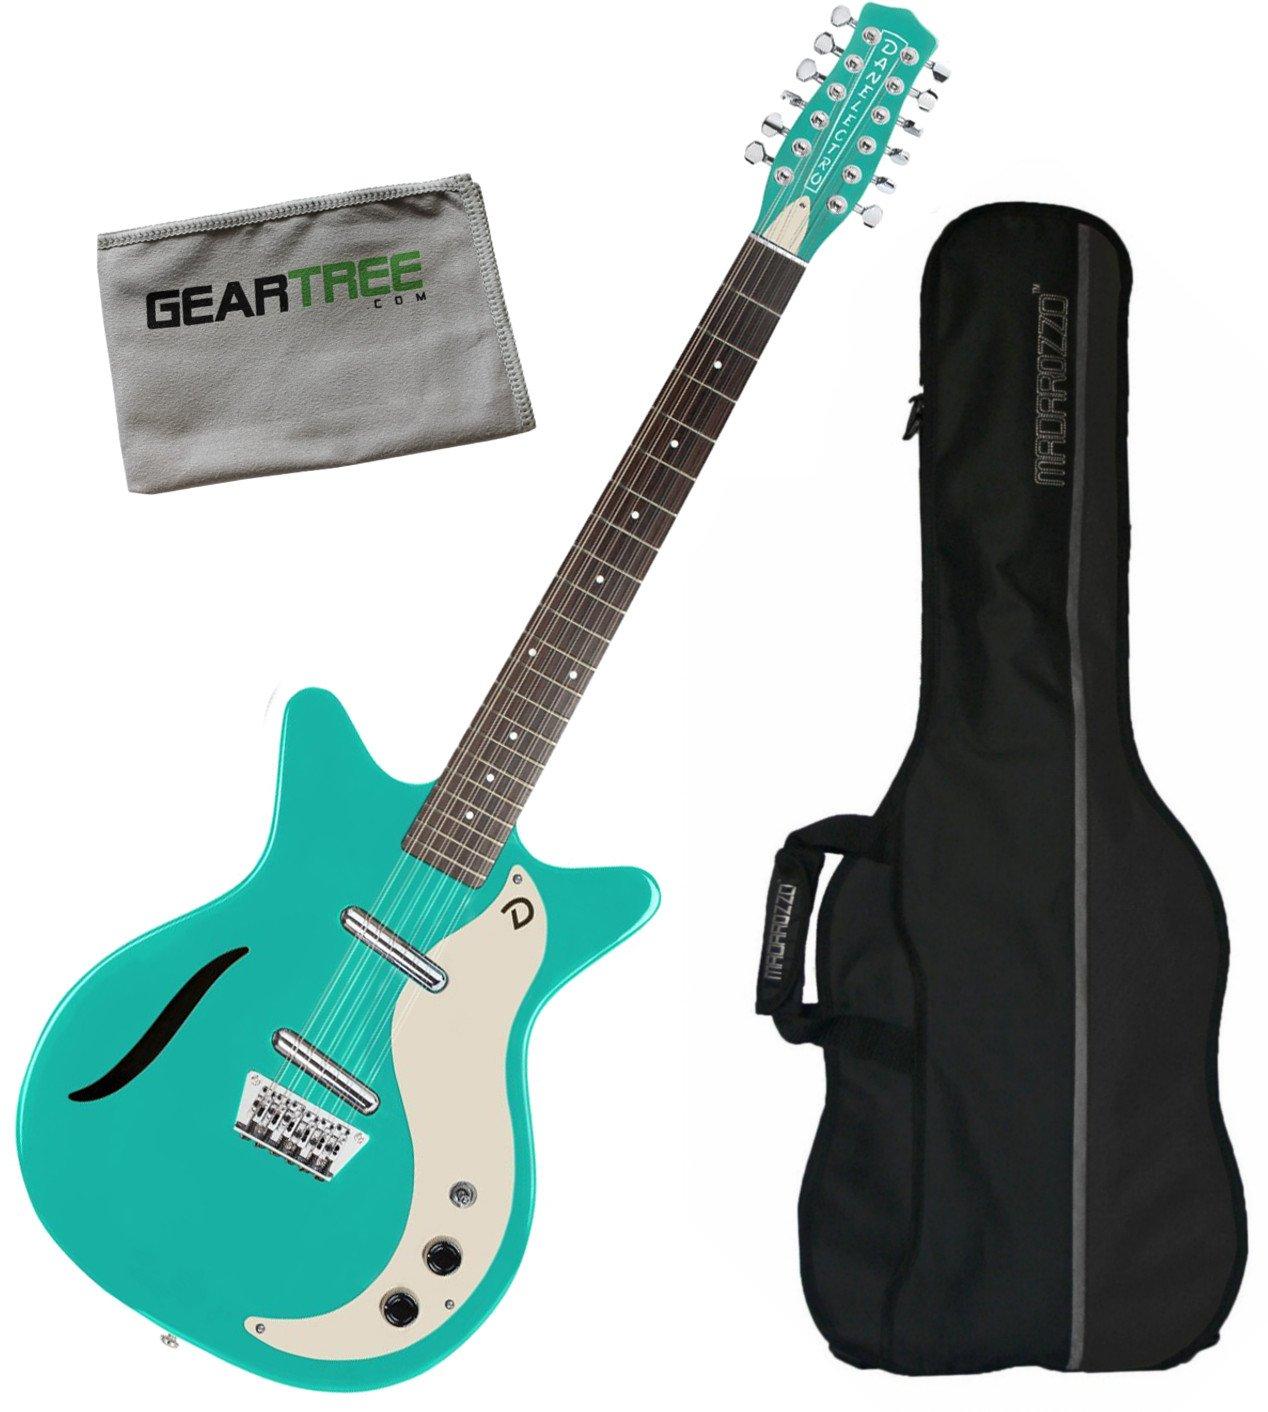 Cheap Danelectro 59 Vintage 12 String Electric Guitar Dark Aqua w/Gig Bag and Geartree Cloth Black Friday & Cyber Monday 2019